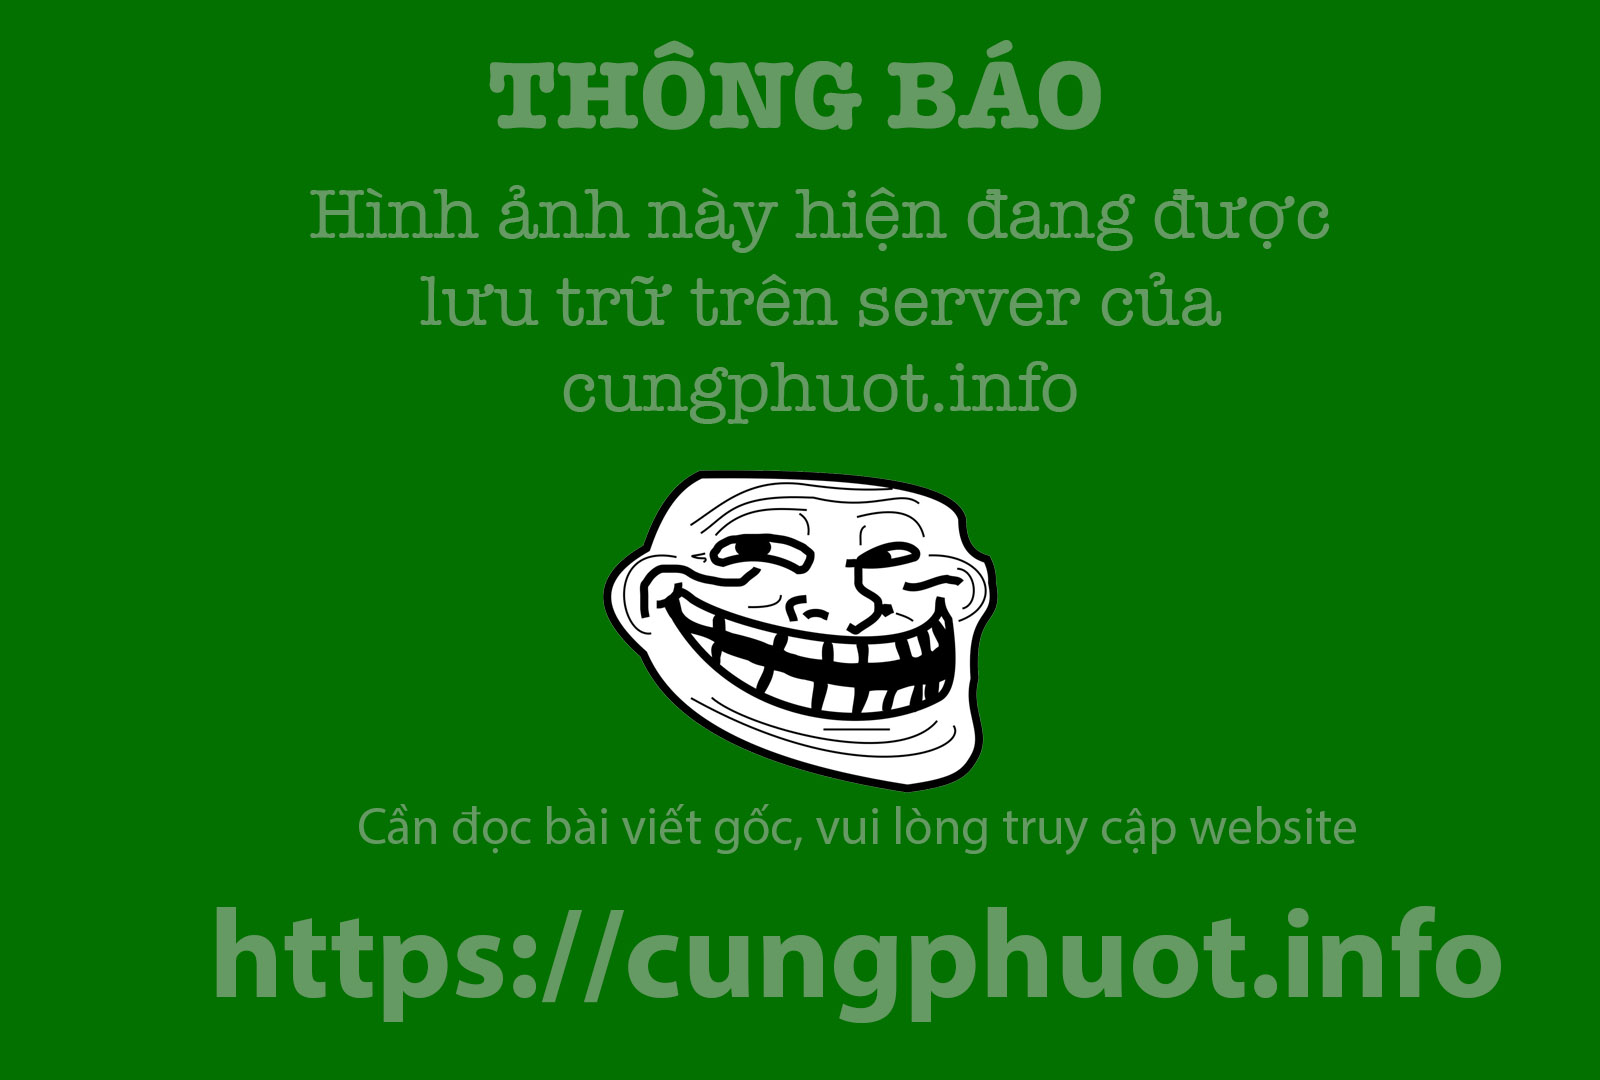 Binh minh tuyet dep tren nhung doi che Tan Cuong hinh anh 7